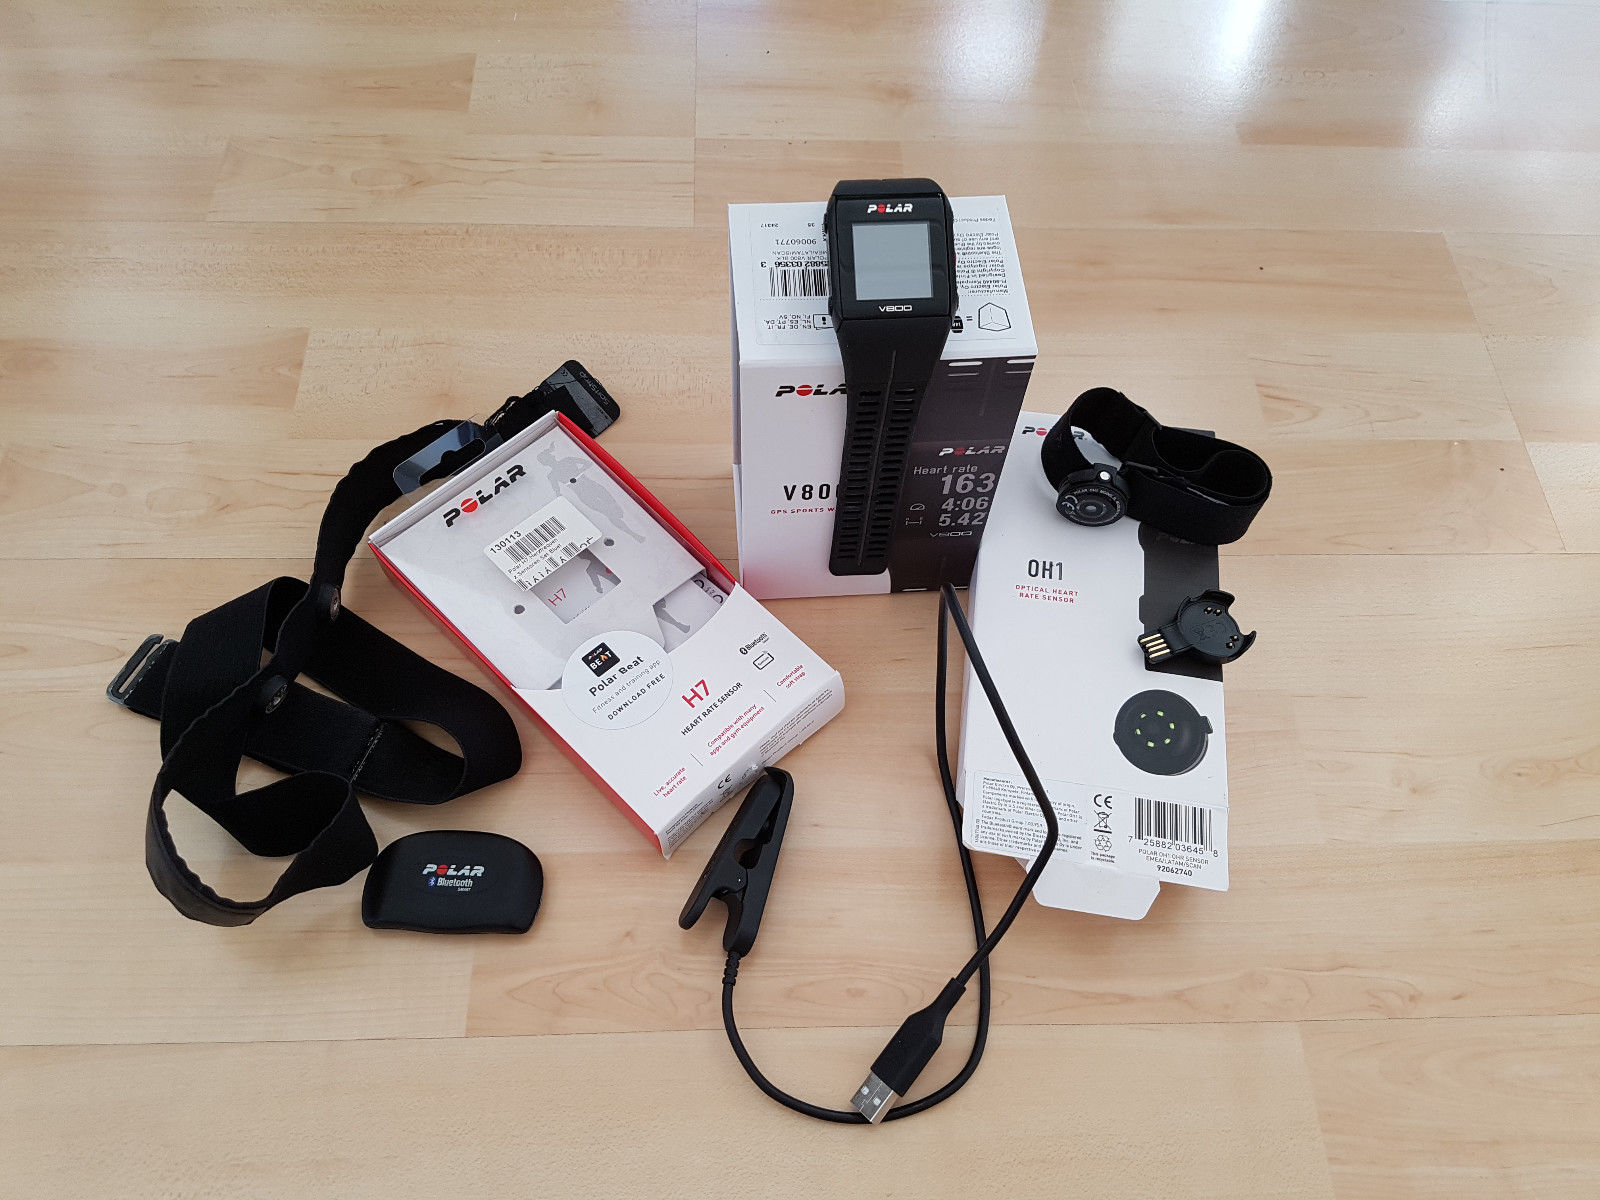 POLAR V800 GPS-Sportuhr, Multisport; schwarz + viel Zubehör + OVP